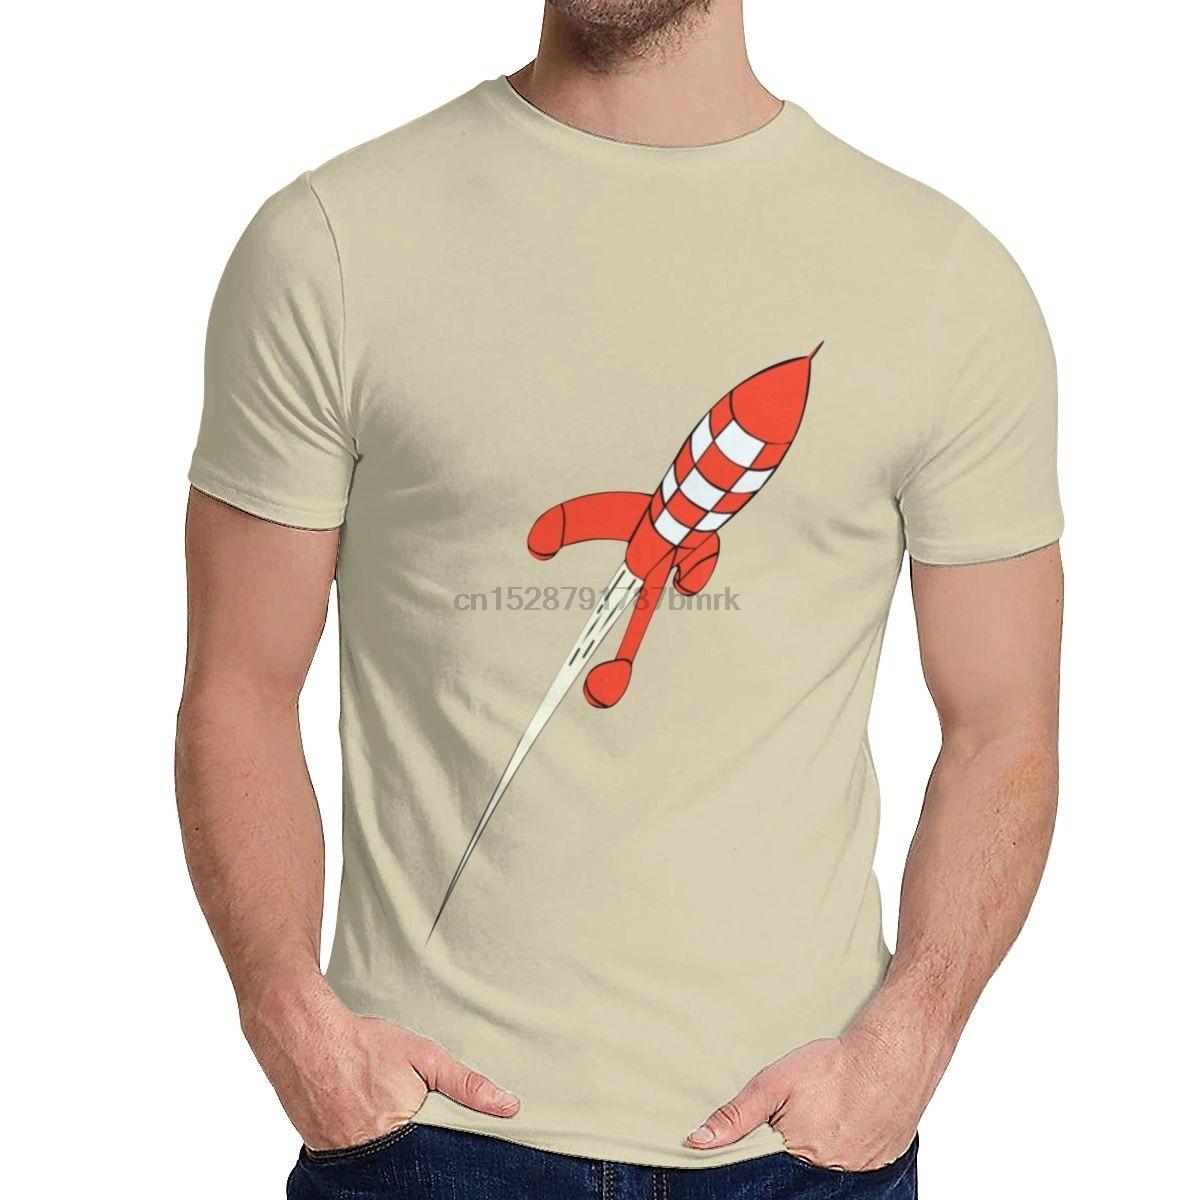 Camiseta de Tintin de algodón para hombre, Camiseta de Tintín The Adventures Of Moon, de destino, de algodón suave, Camiseta de cuello redondo a la moda para verano